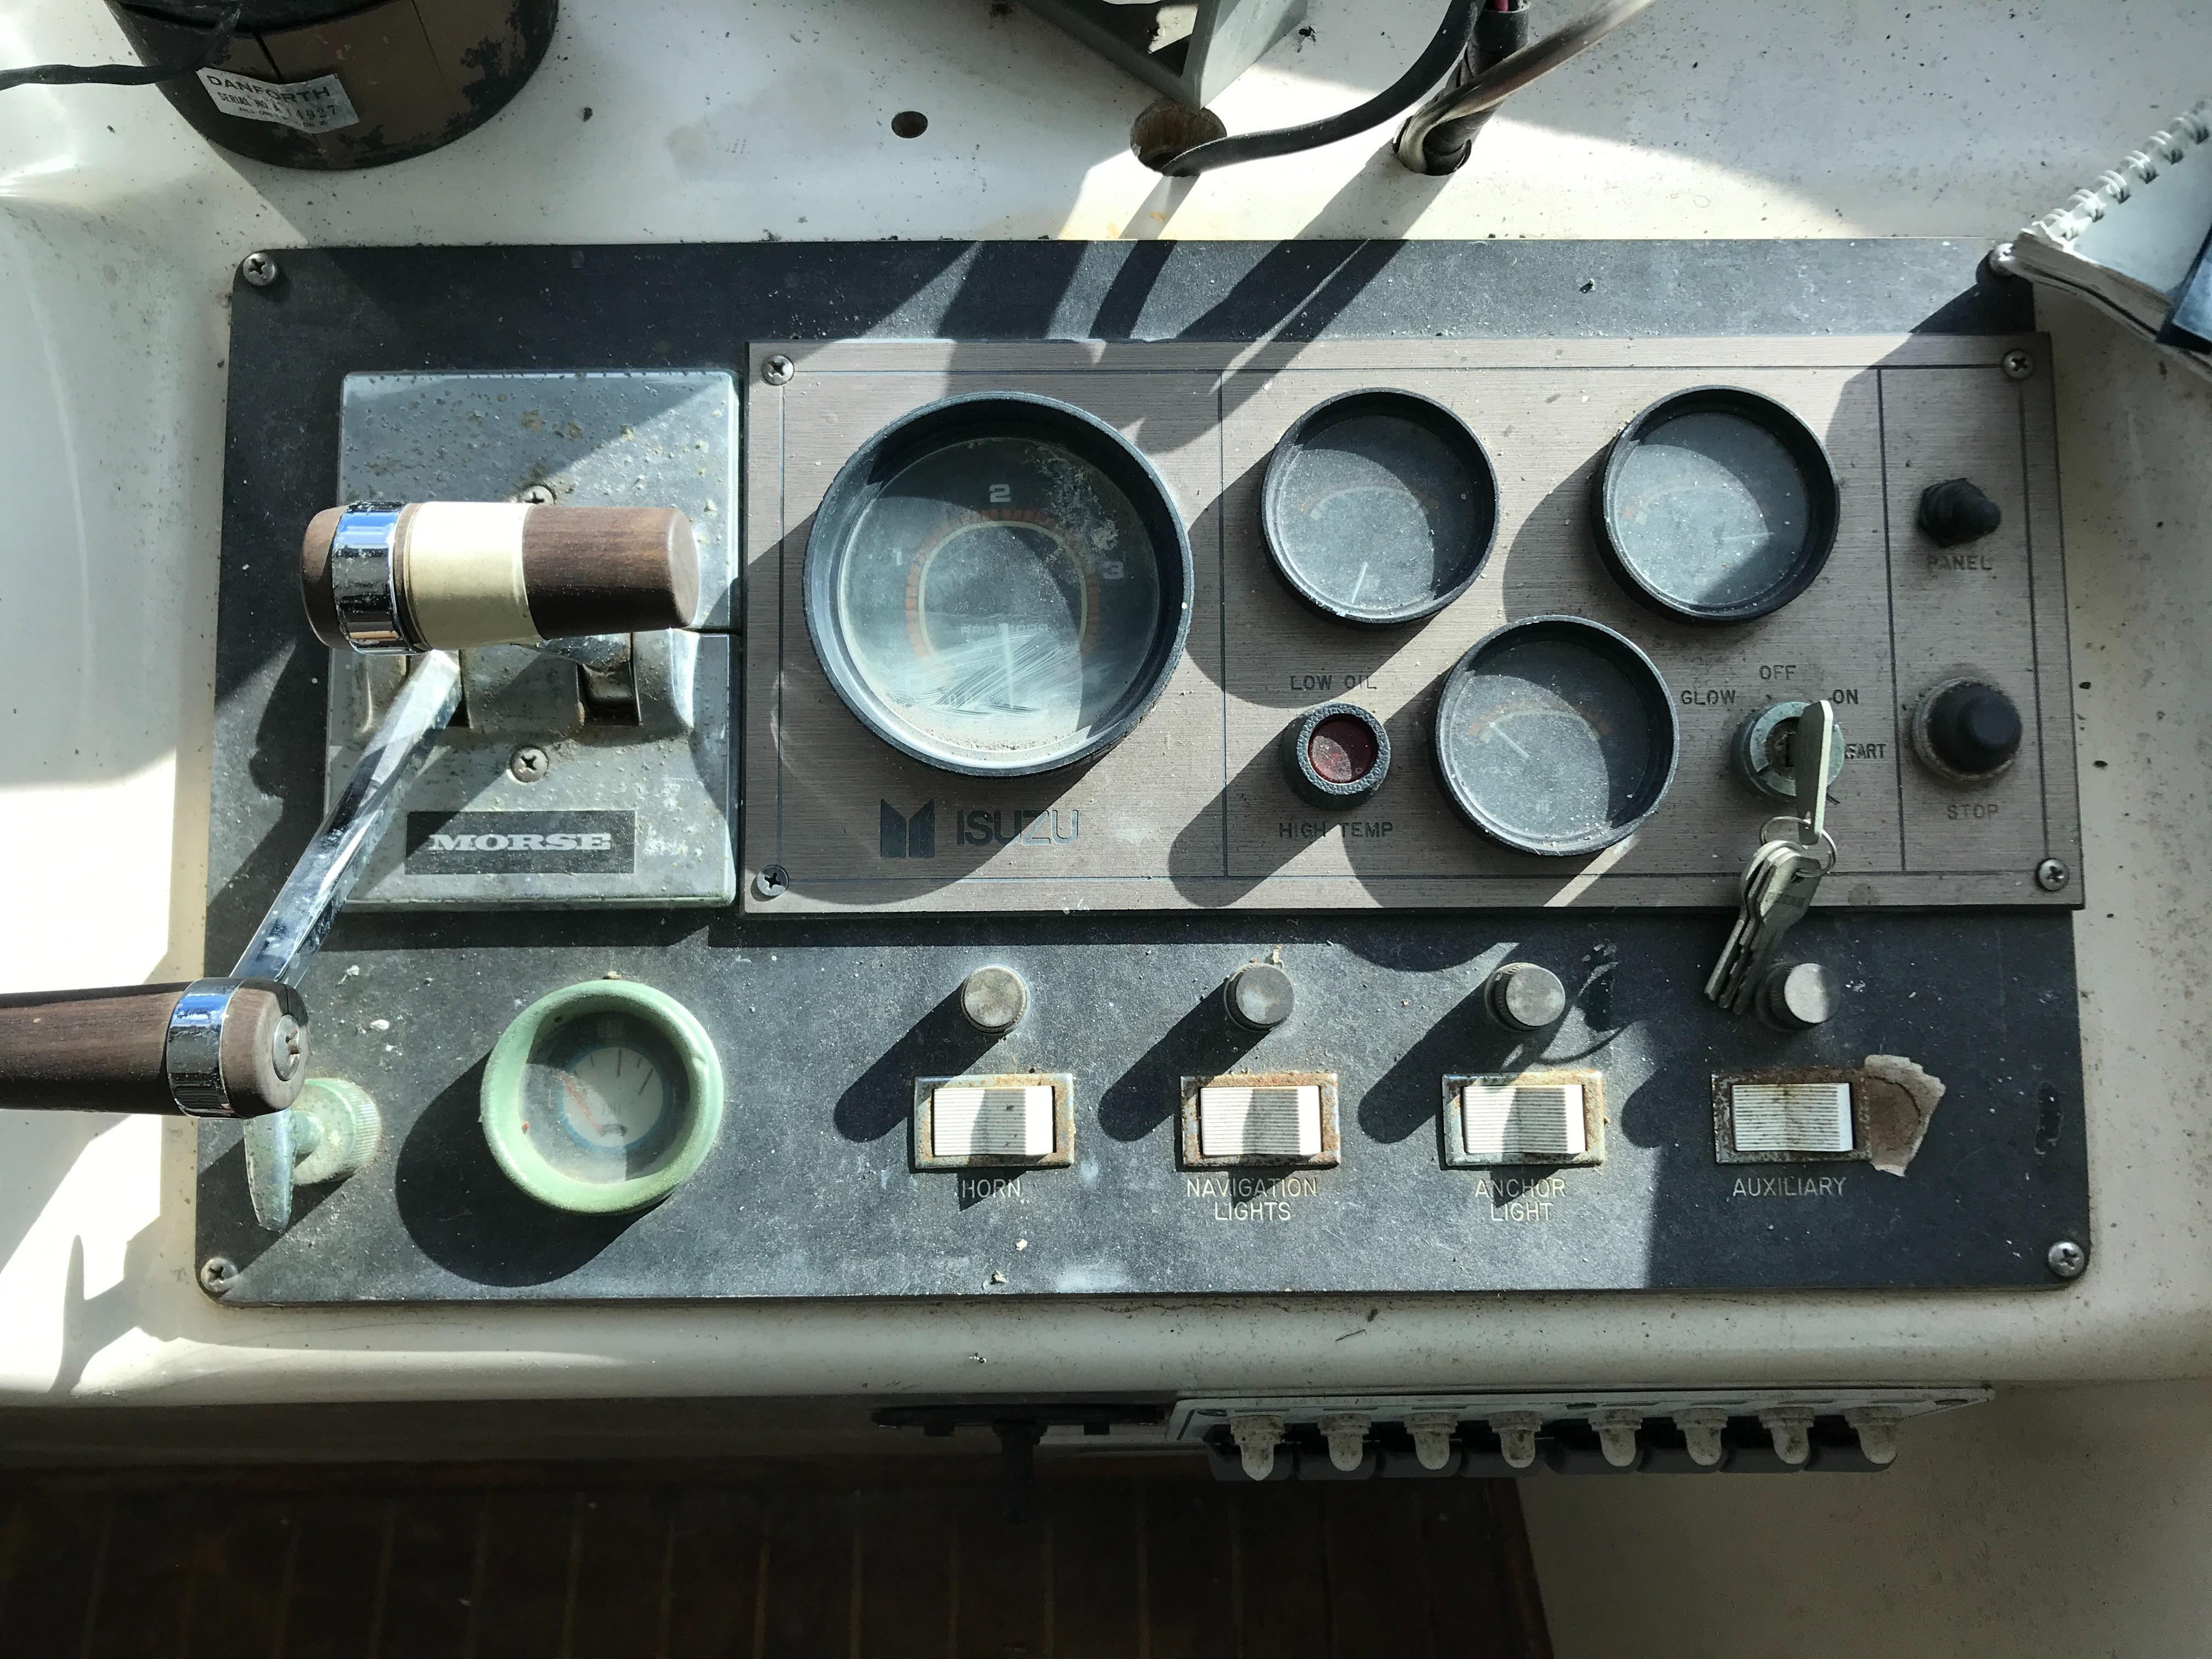 Carri-craft 57 Catamaran - port engine controls